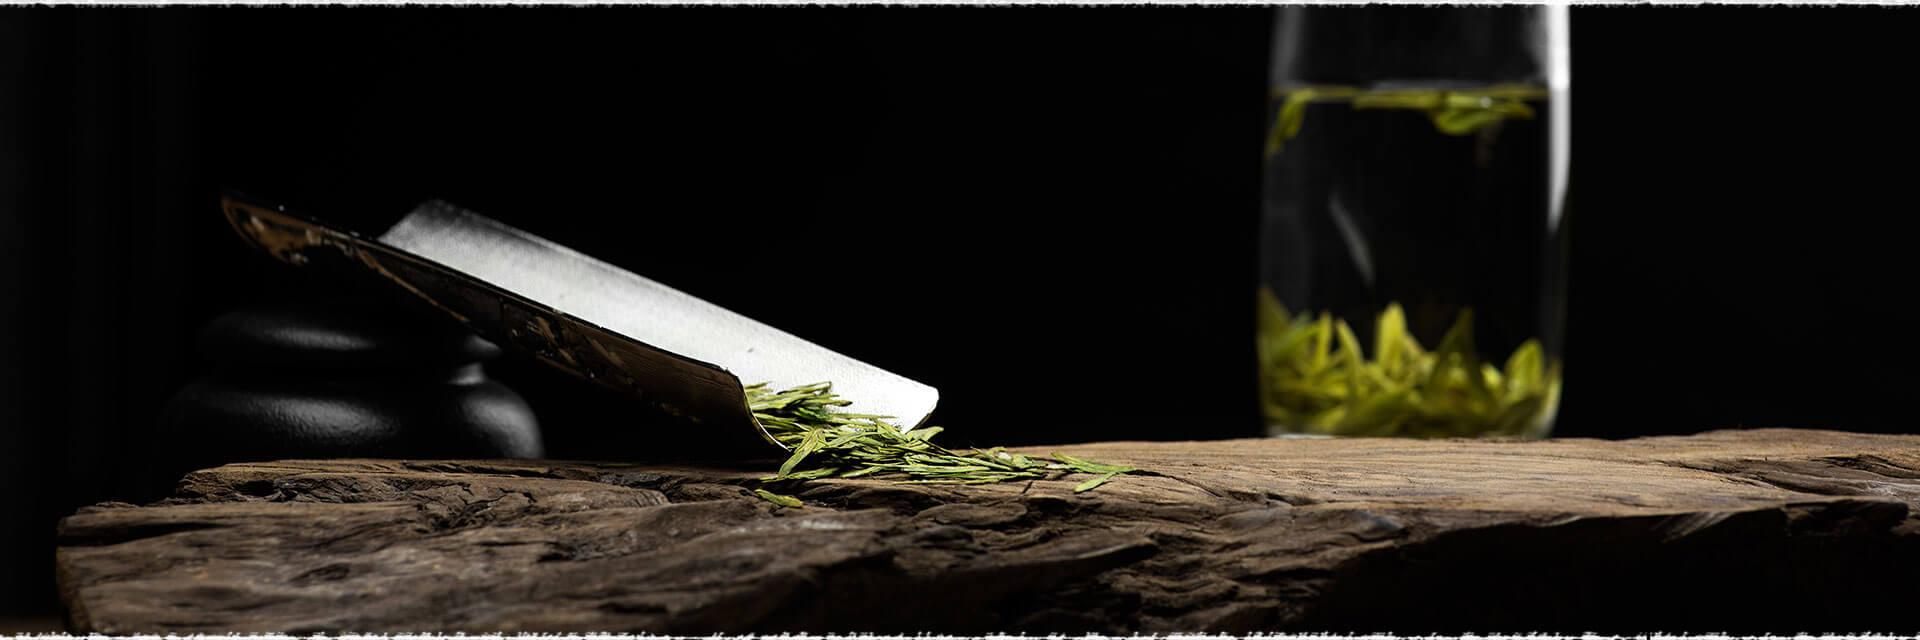 Superfine Pre-Ming -Dragon Well Long Jing- Green tea